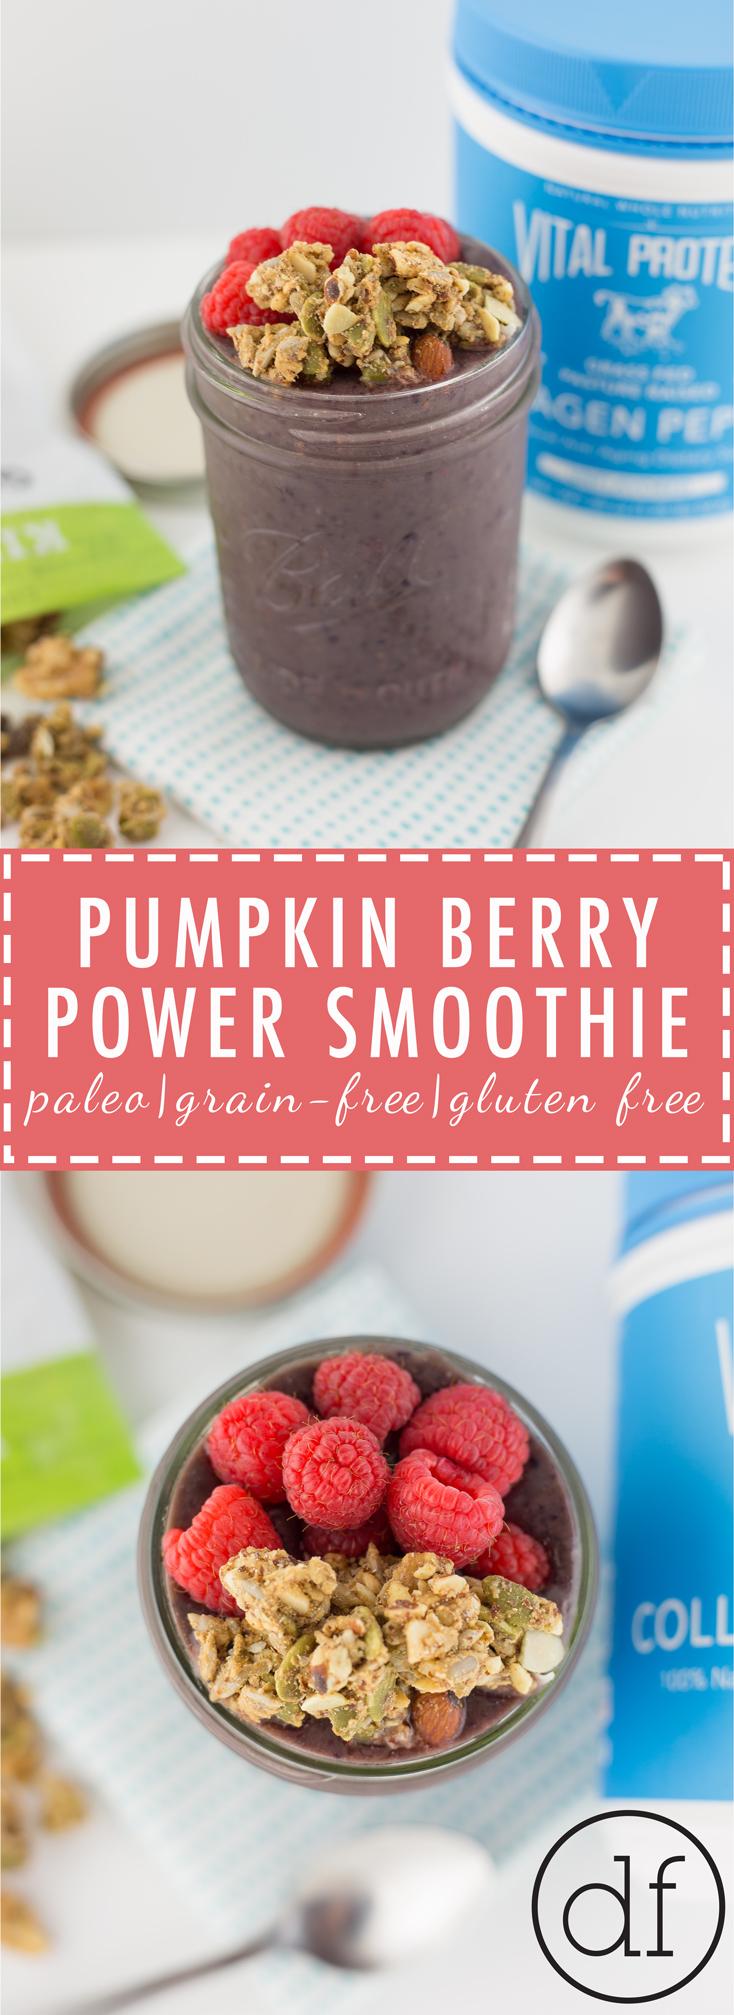 Pumpkin Berry Power Smoothie, Paleo, Gluten Free, Dairy Free, Whole30, Primal, Easy, Quick